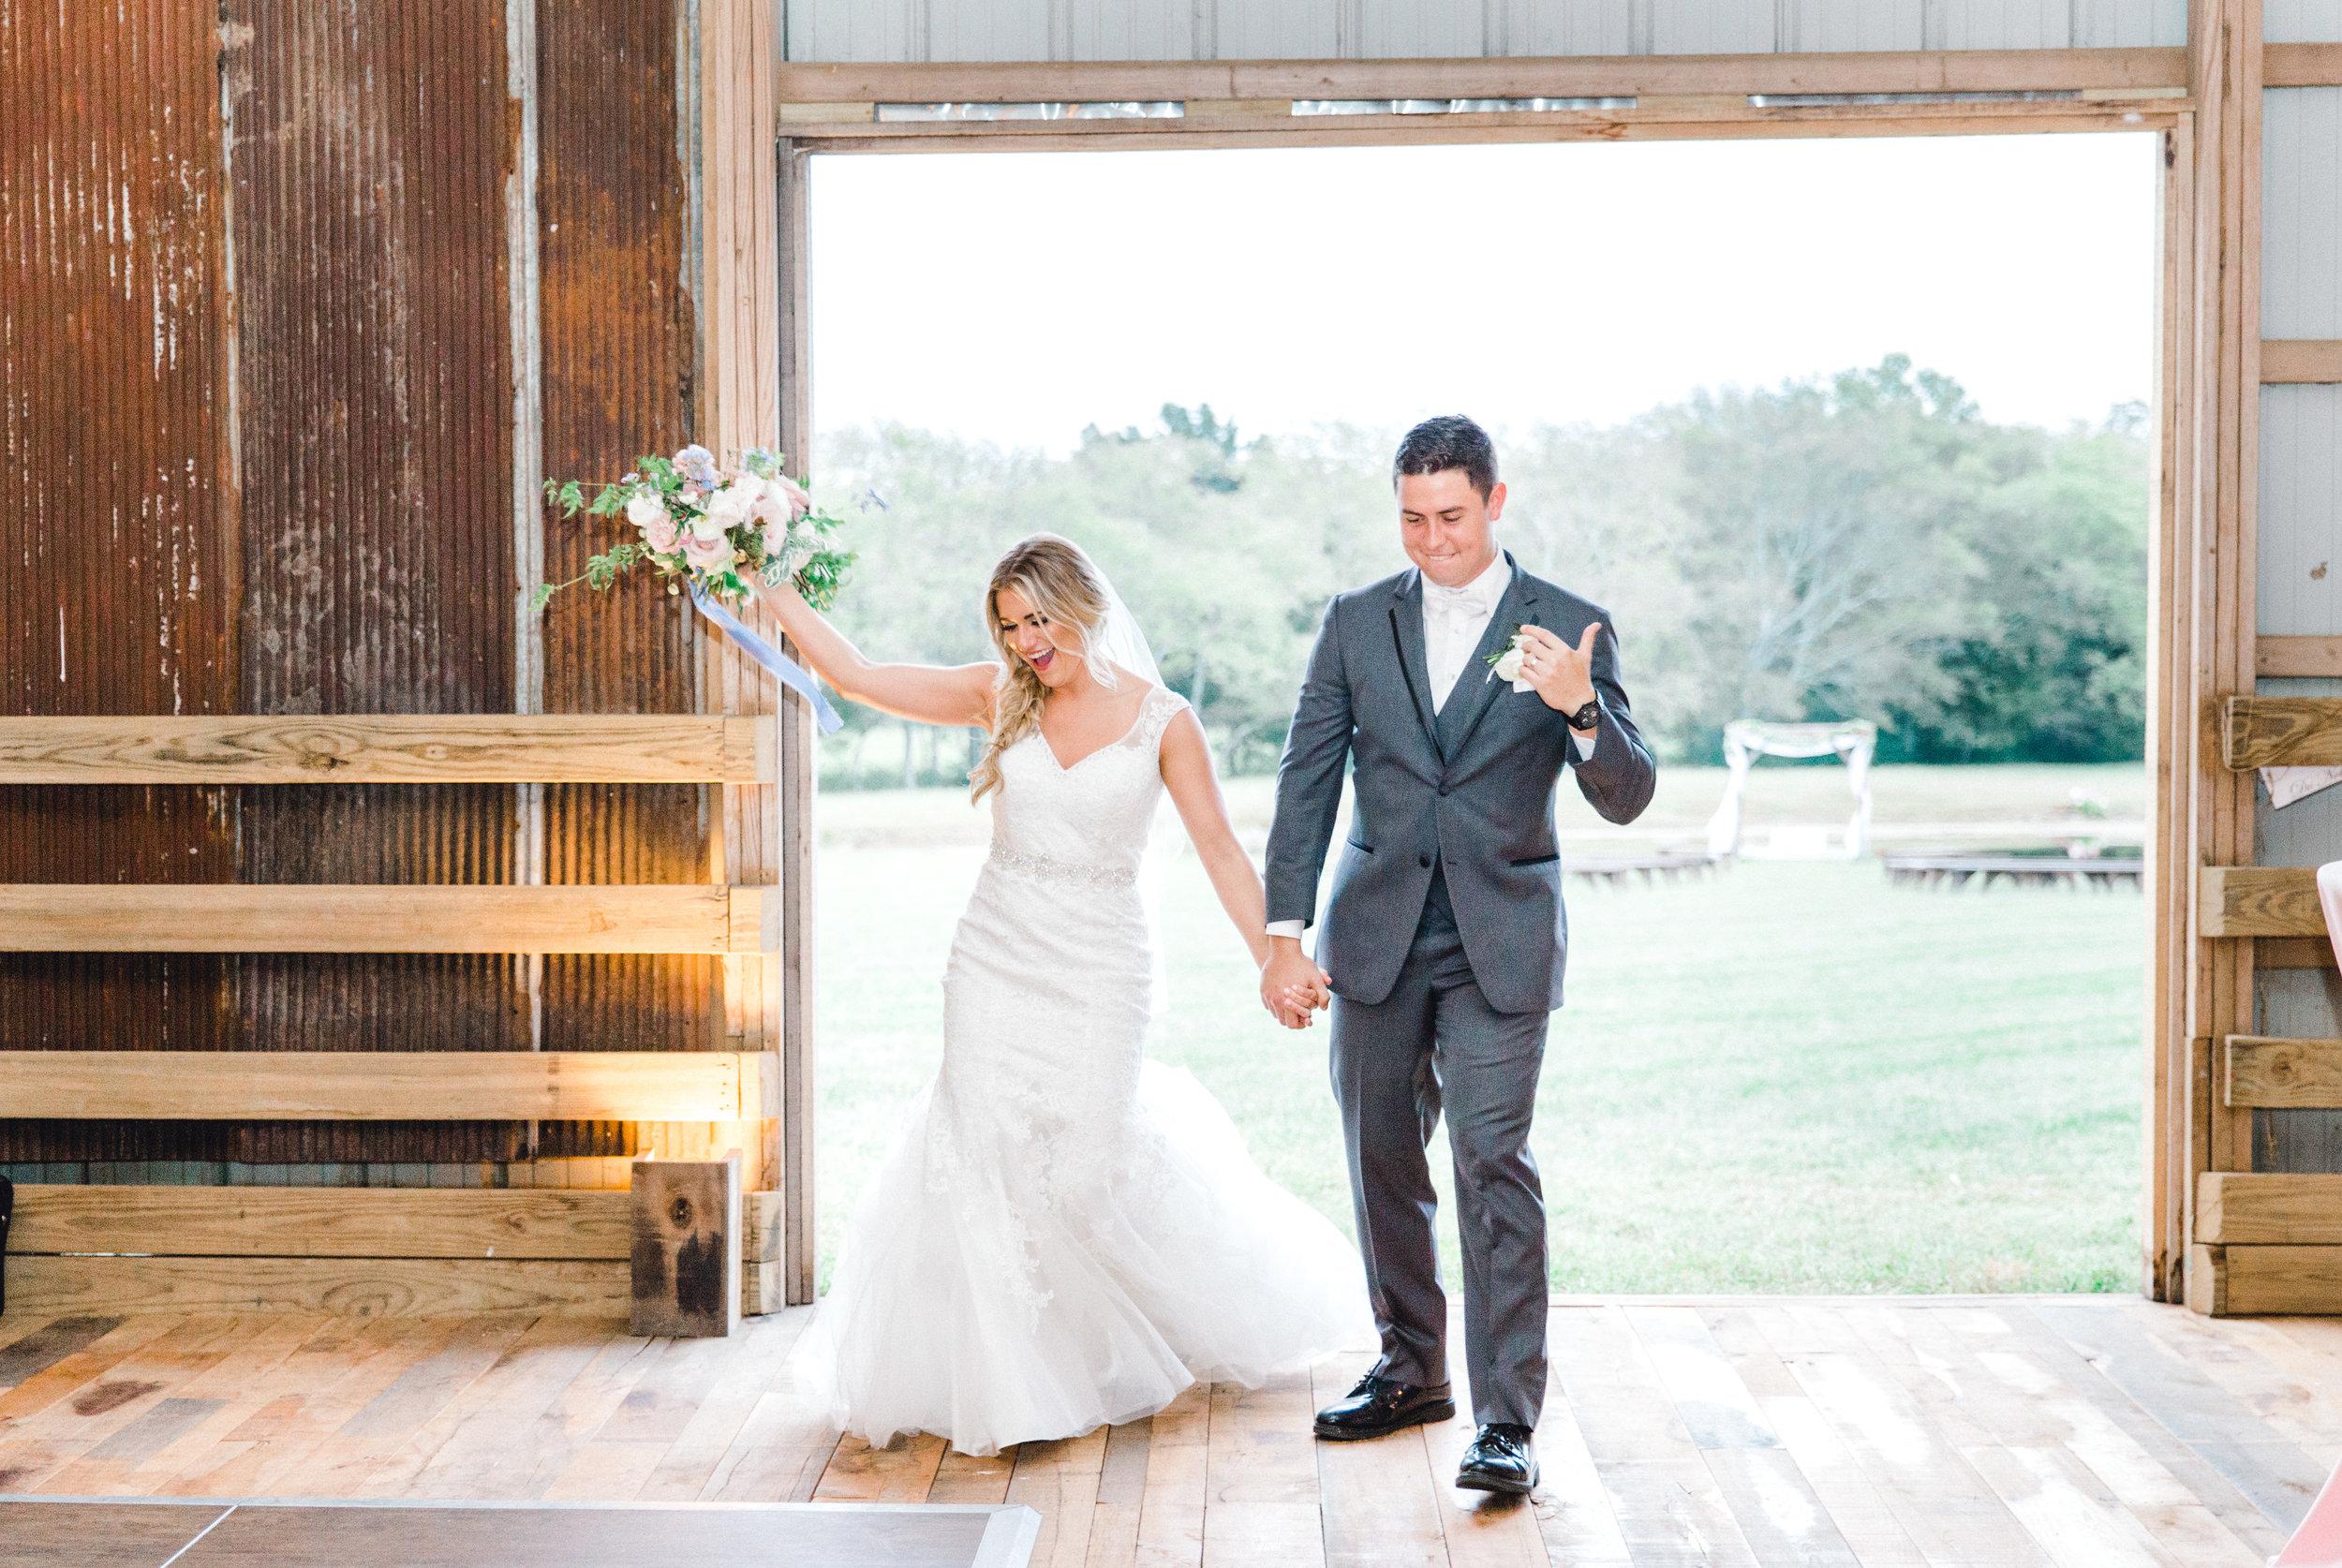 Paige-Mercer-Photography-Florida-Wedding-Photographer-Alyssa&Drew-76.jpg